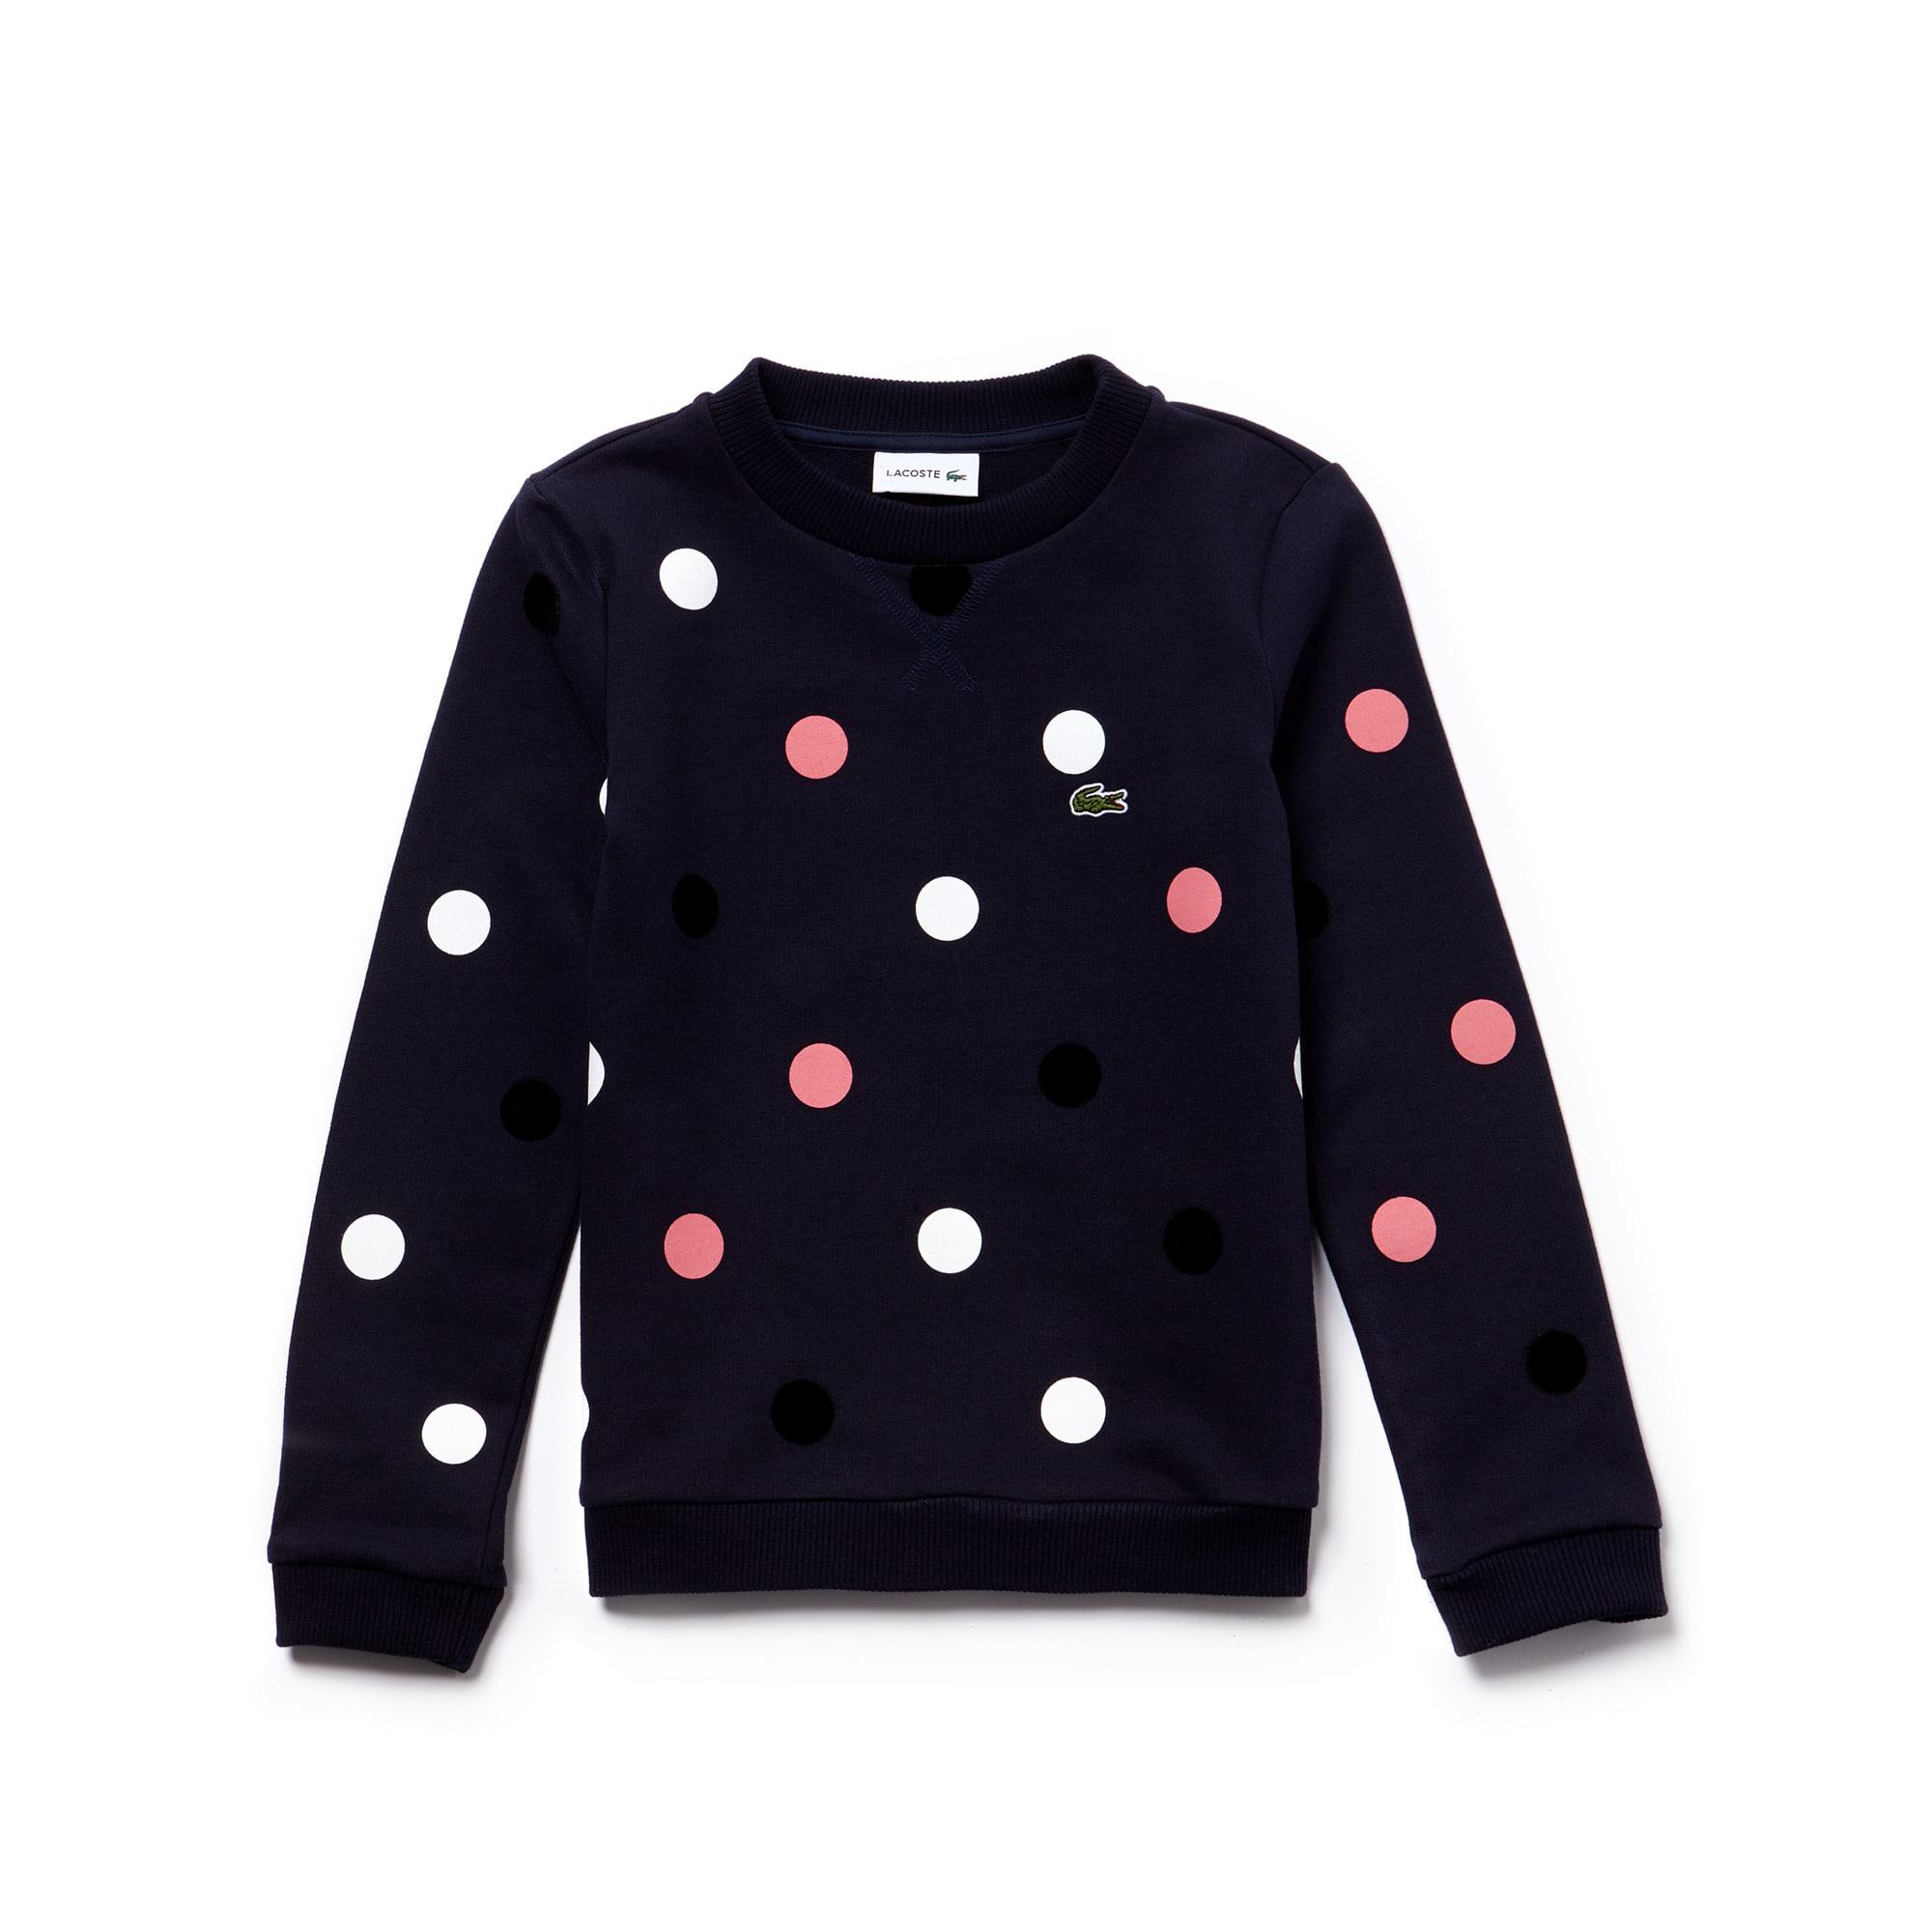 Girls' Polka Dot Stretch Cotton Fleece Sweatshirt